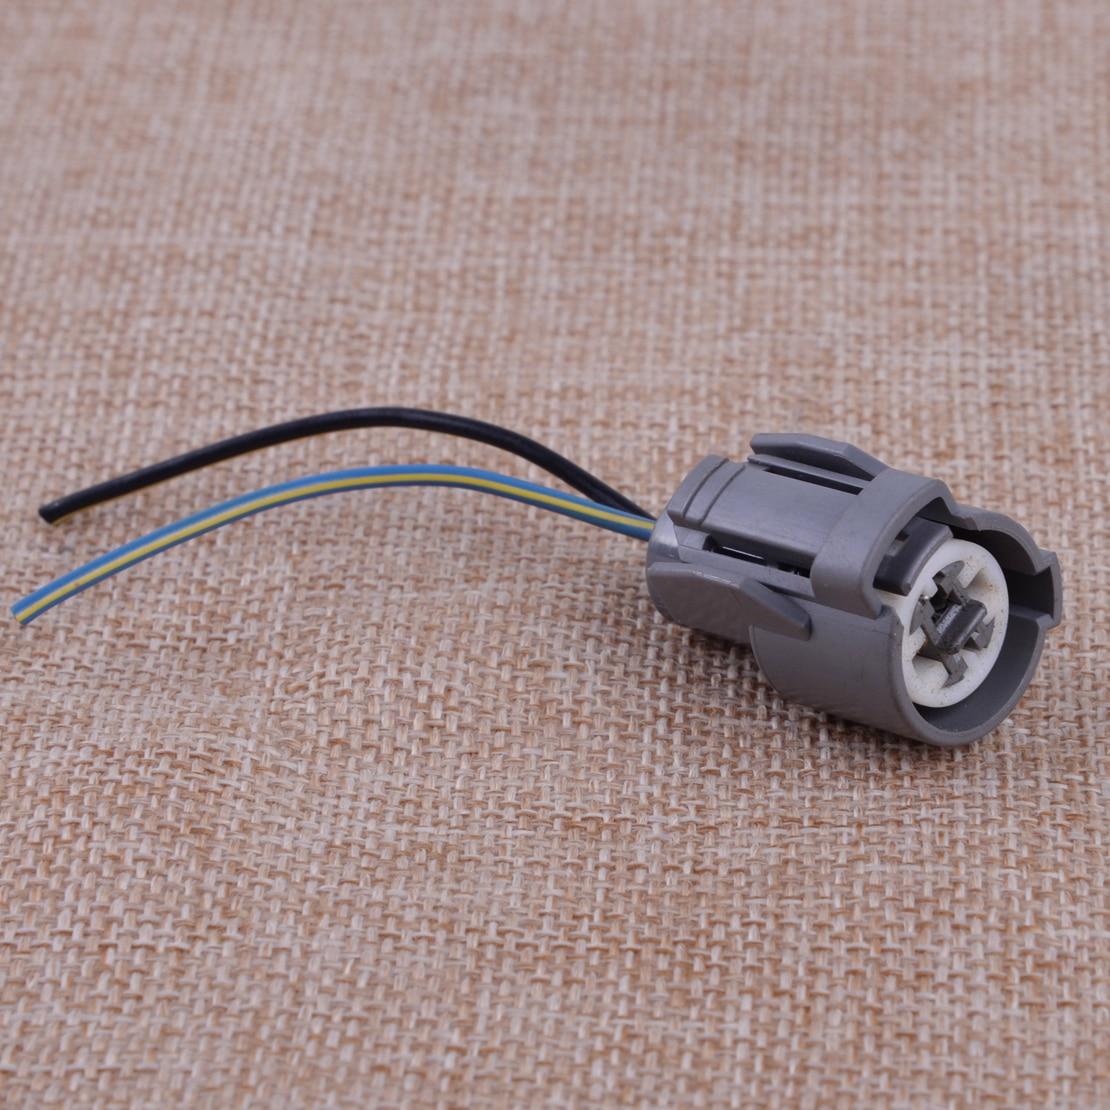 CITALL IAT Intake Air Fan Coolant Temperature Sensor Connector Plug Pigtail Fit for Honda Civic B D H F Engines